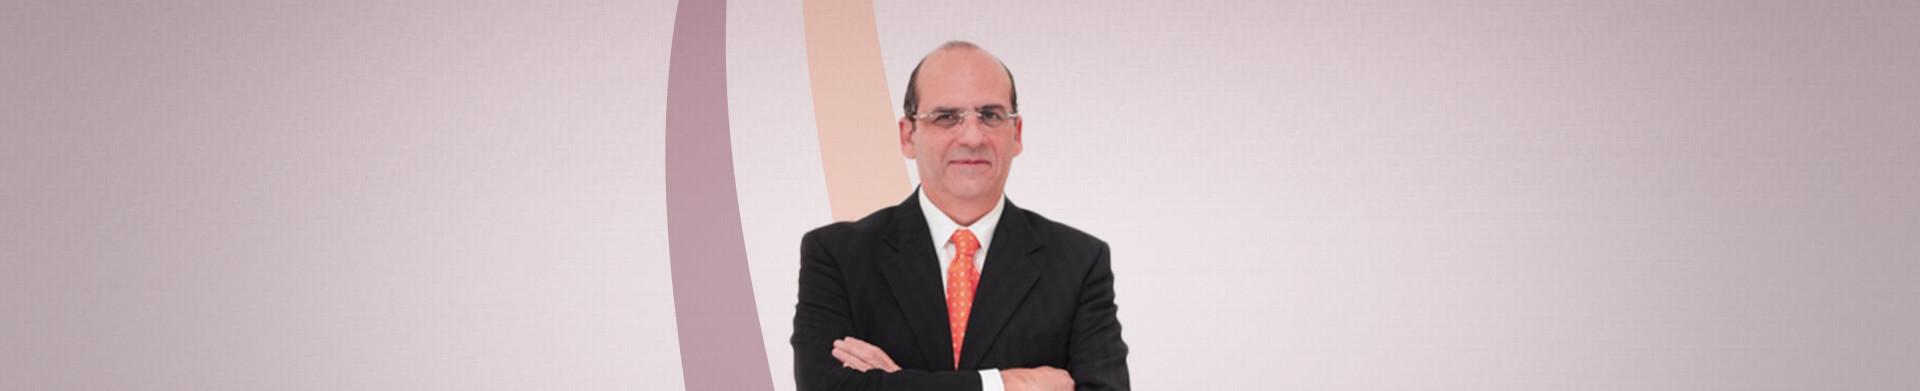 Imagem Dr. Julio Soncini